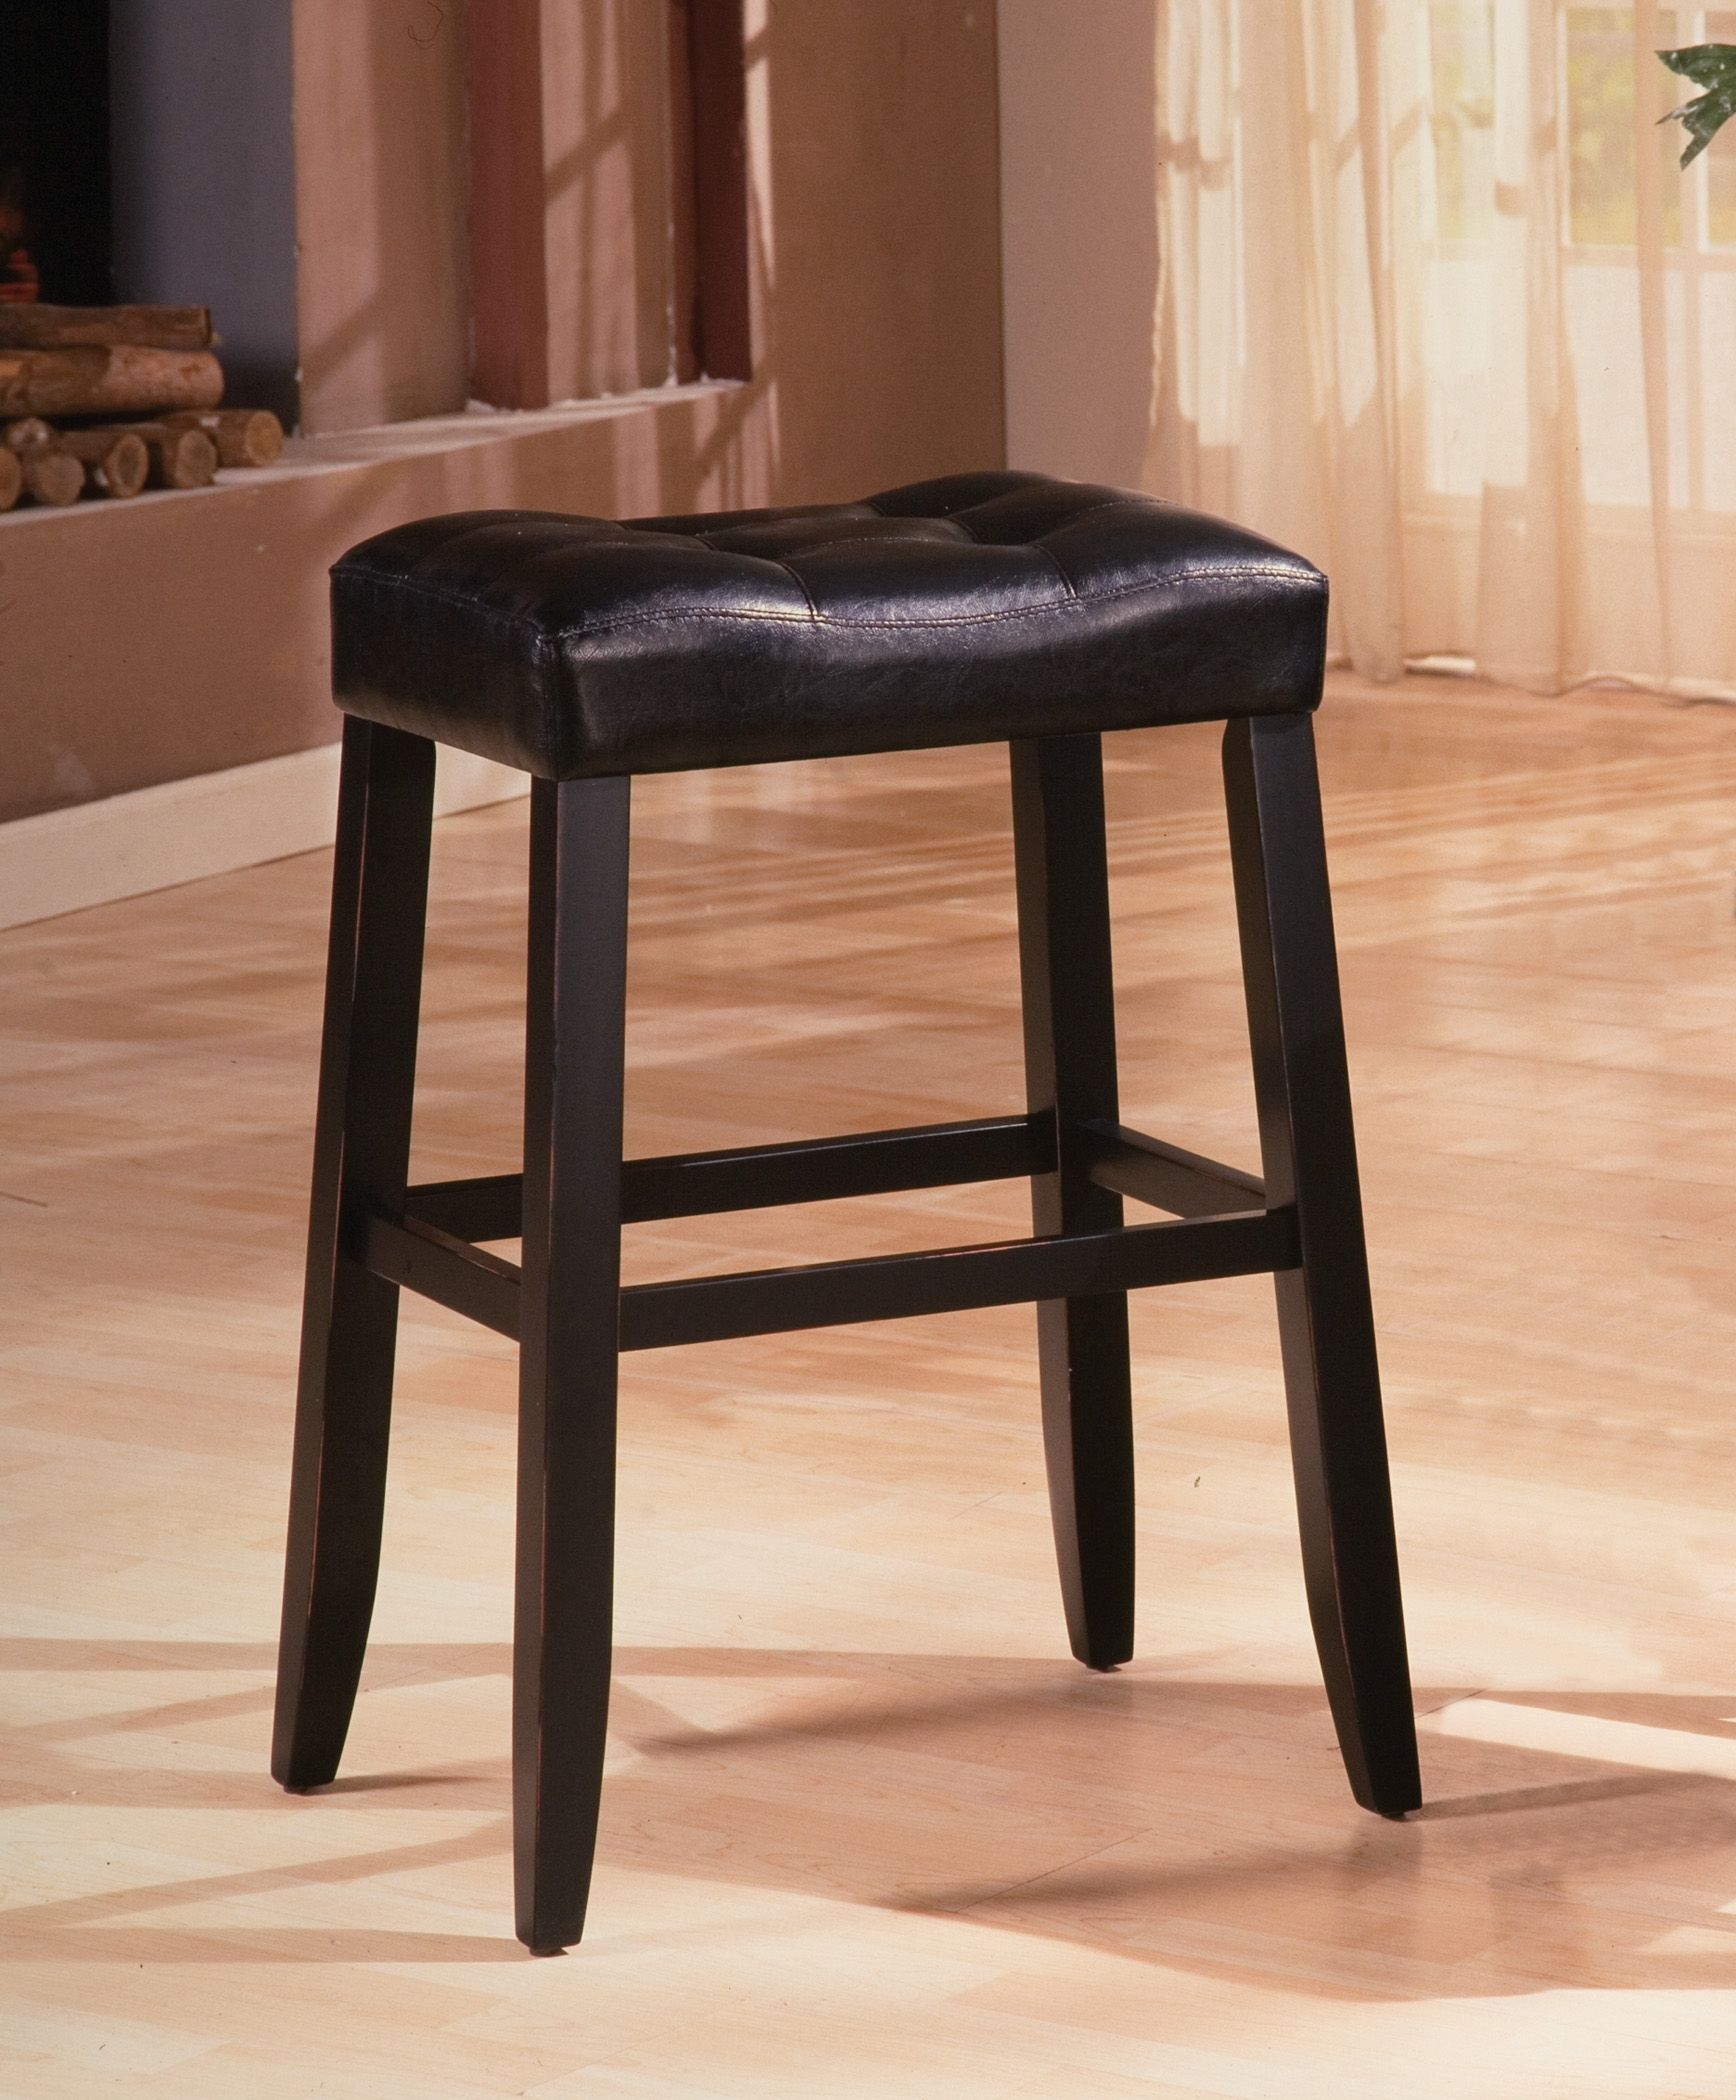 9 Atemberaubende Menards Barhockern Bilder Design Stühle   Bar ...